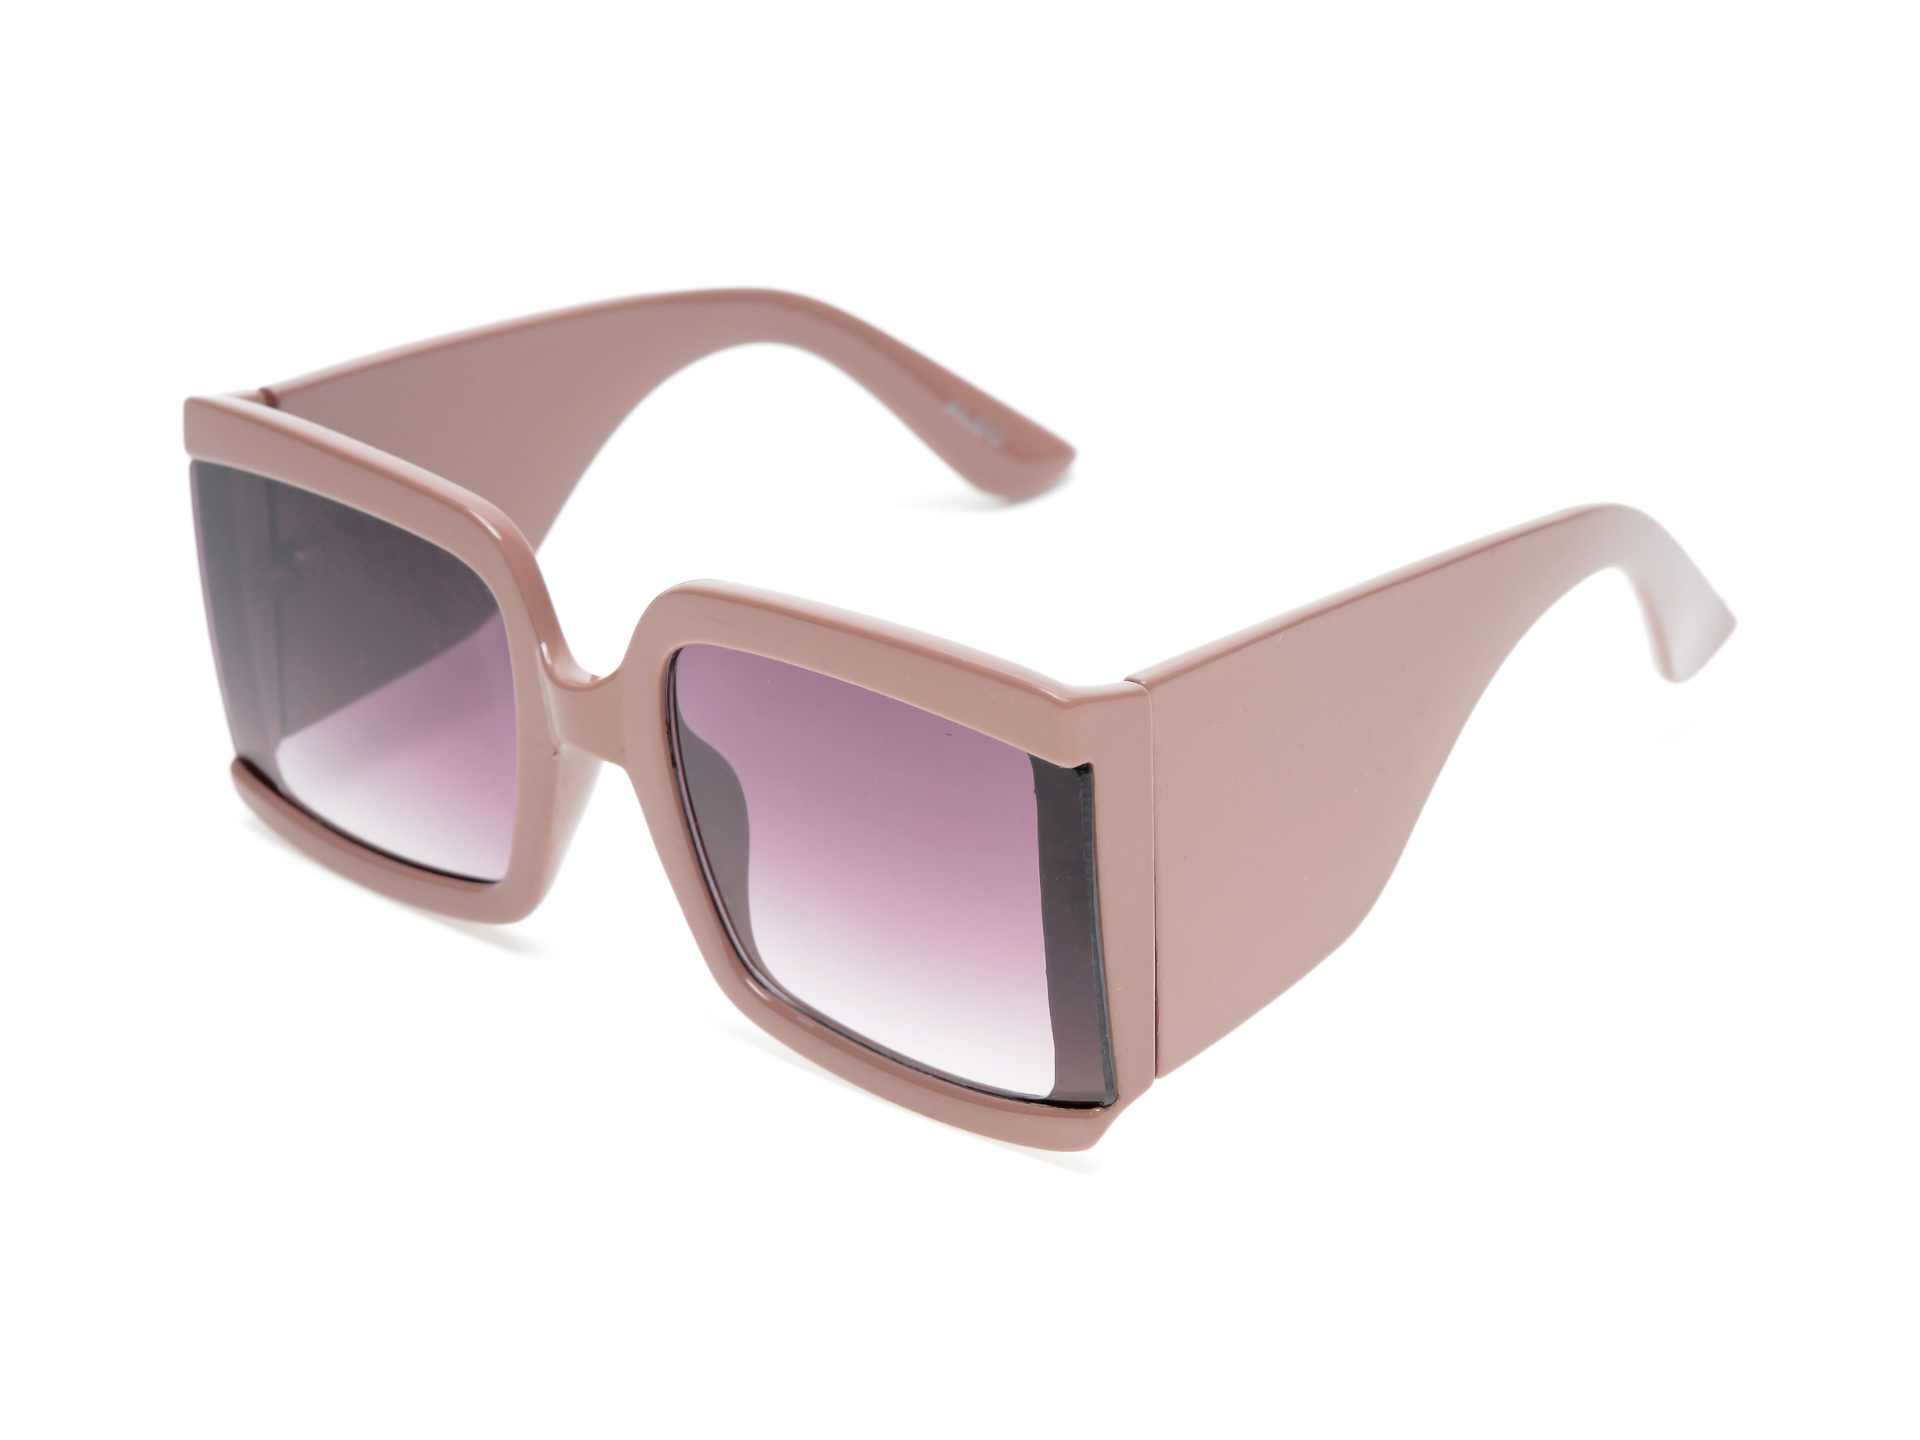 Ochelari de soare ALDO bej, Renchen101, din pvc imagine